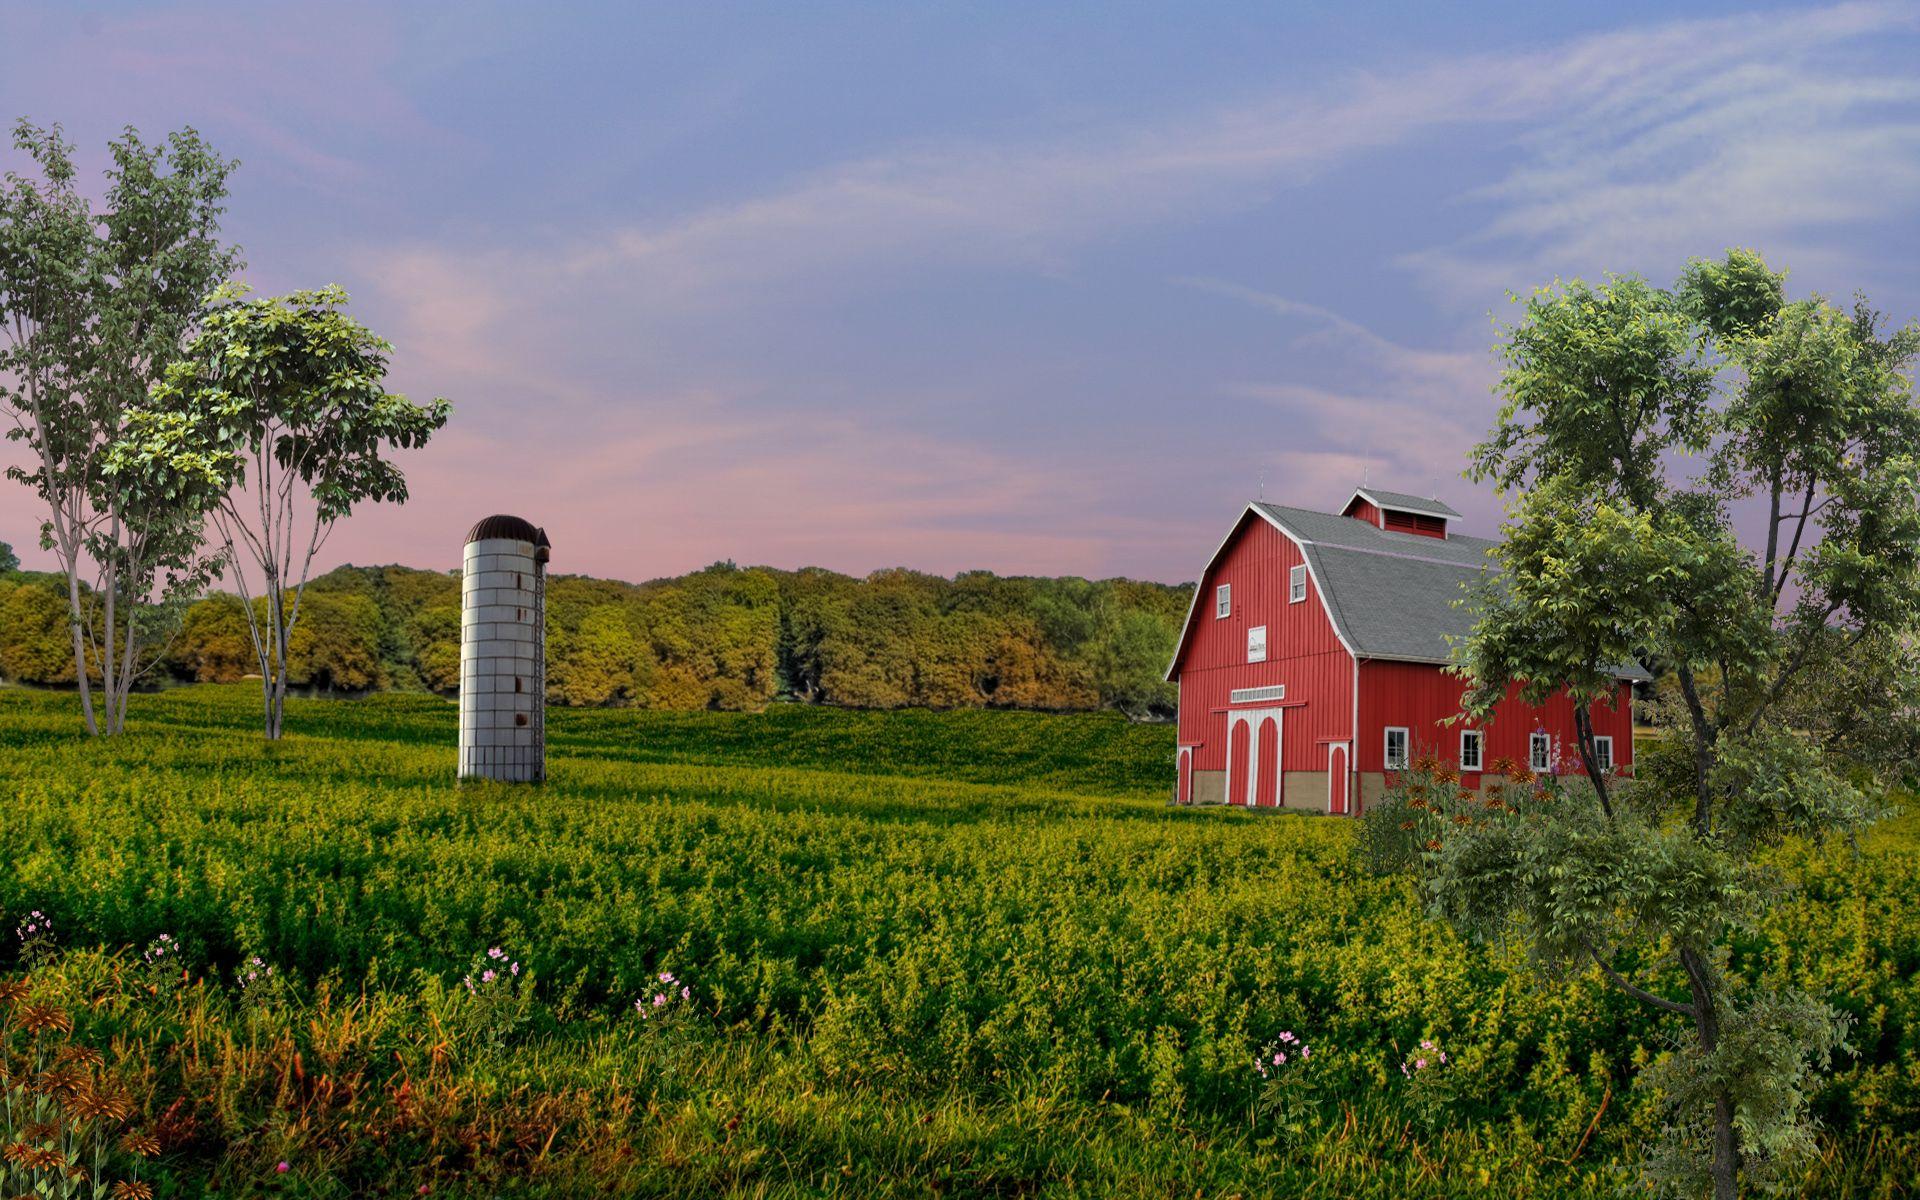 virginia farm country barns pinterest country farm country